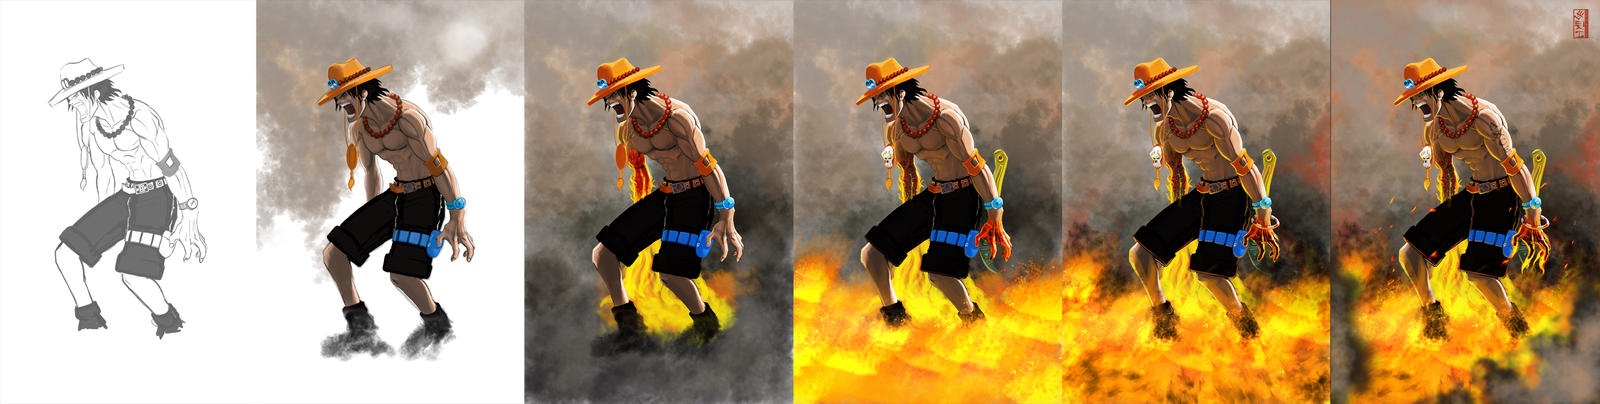 Tuto Ace by wyv1